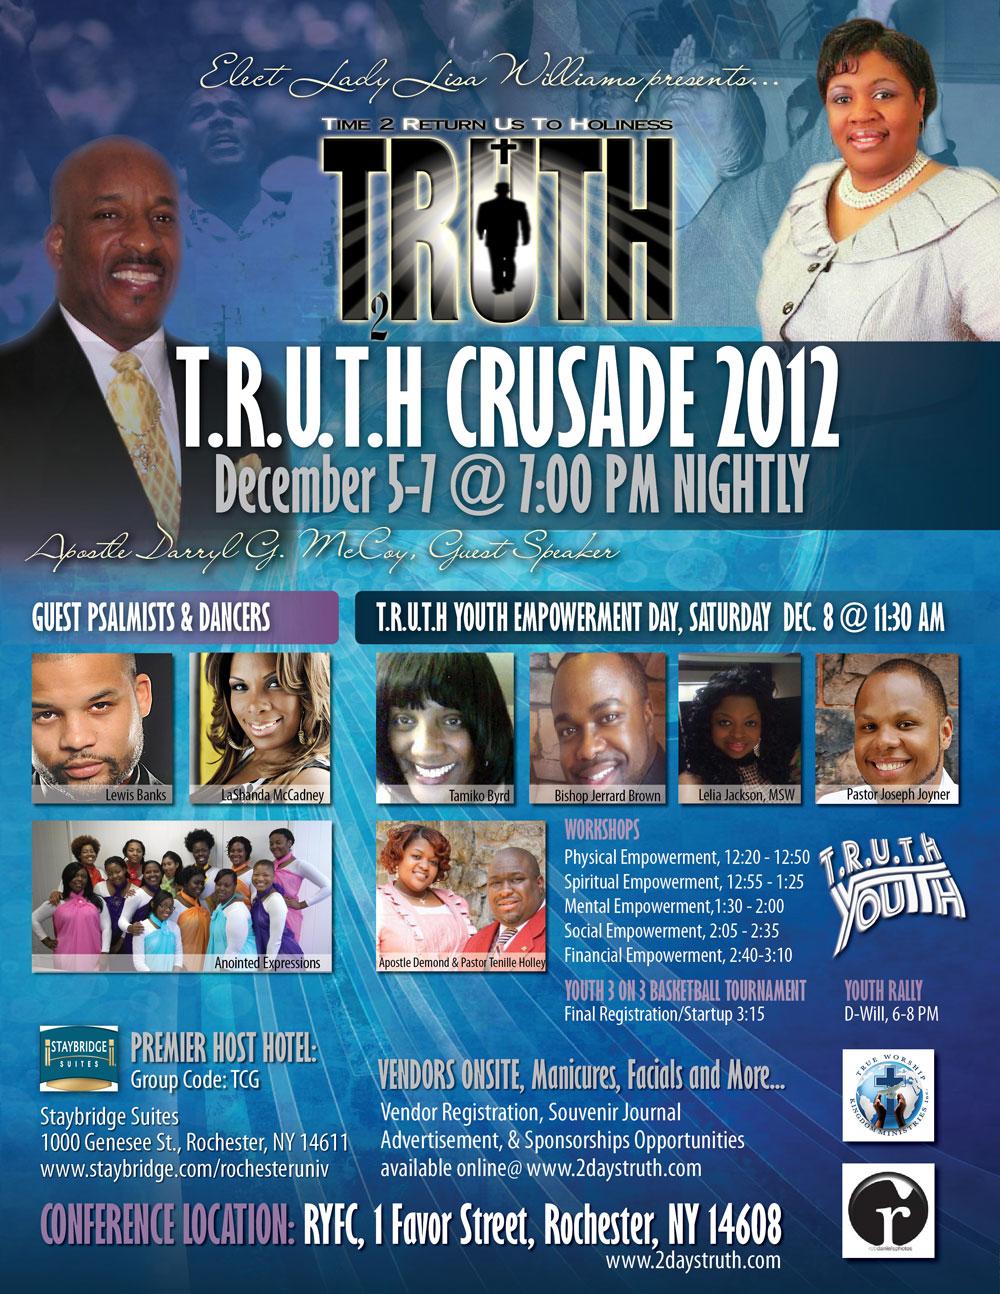 TRUTH CRUSADE 2012